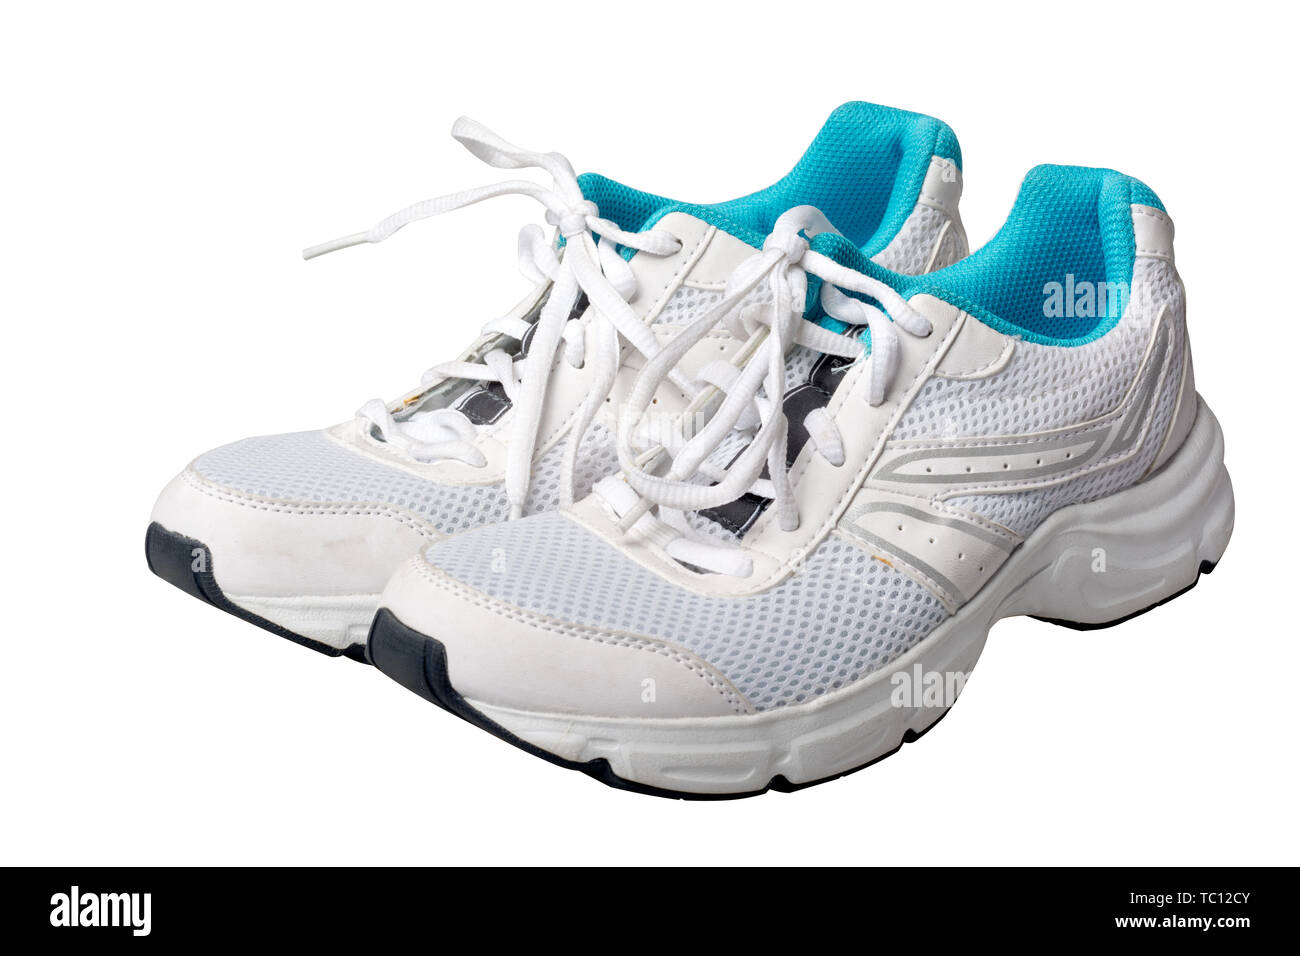 isolated sports shoes on white background Stock Photo